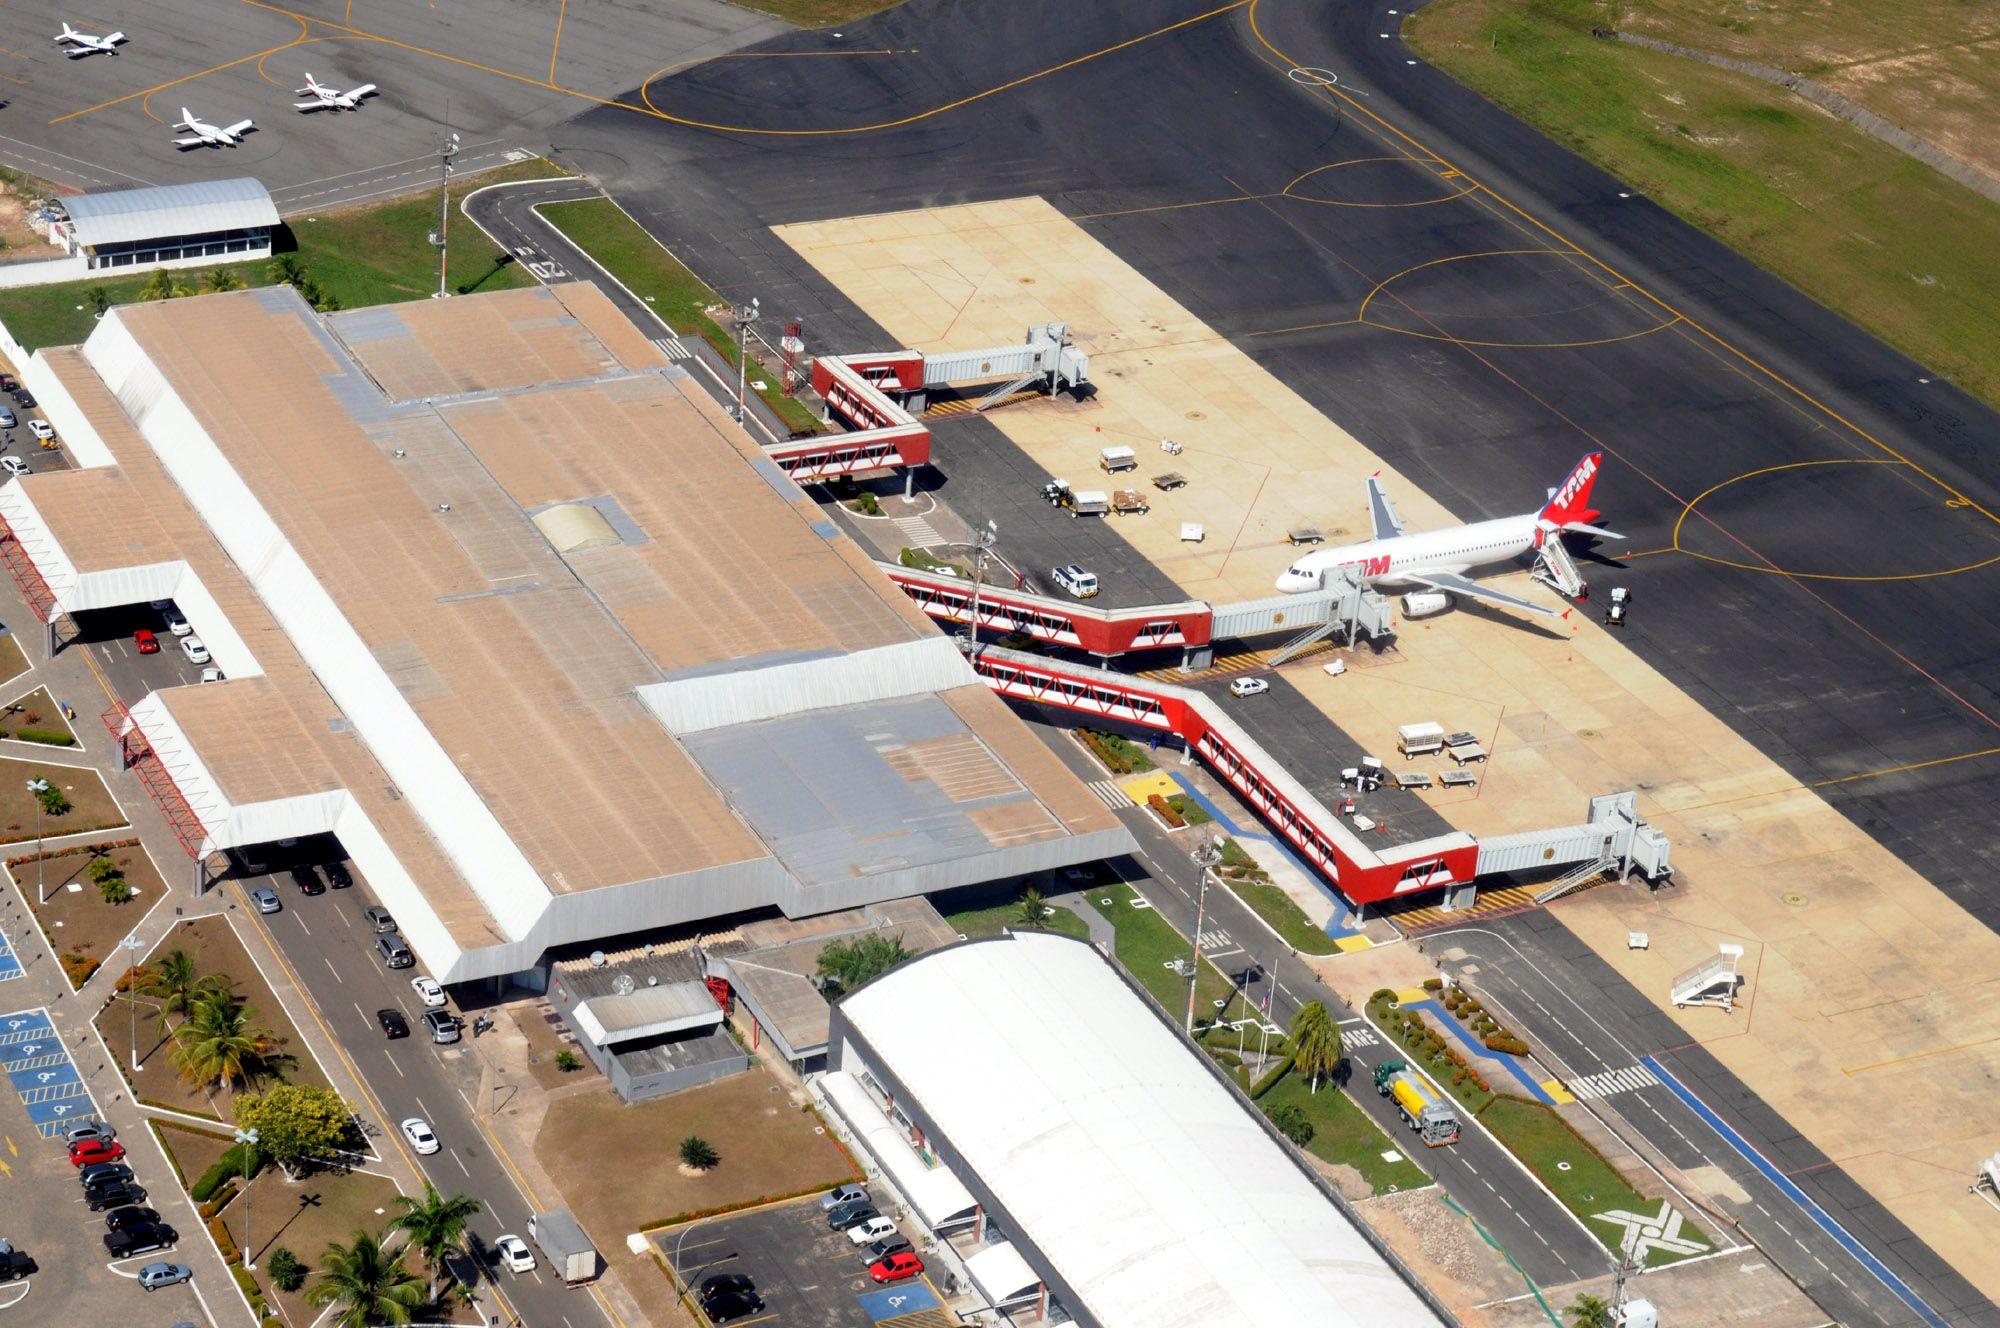 Aeroporto Ewr : Avião pousando no aeroporto de newark u fotografia de stock